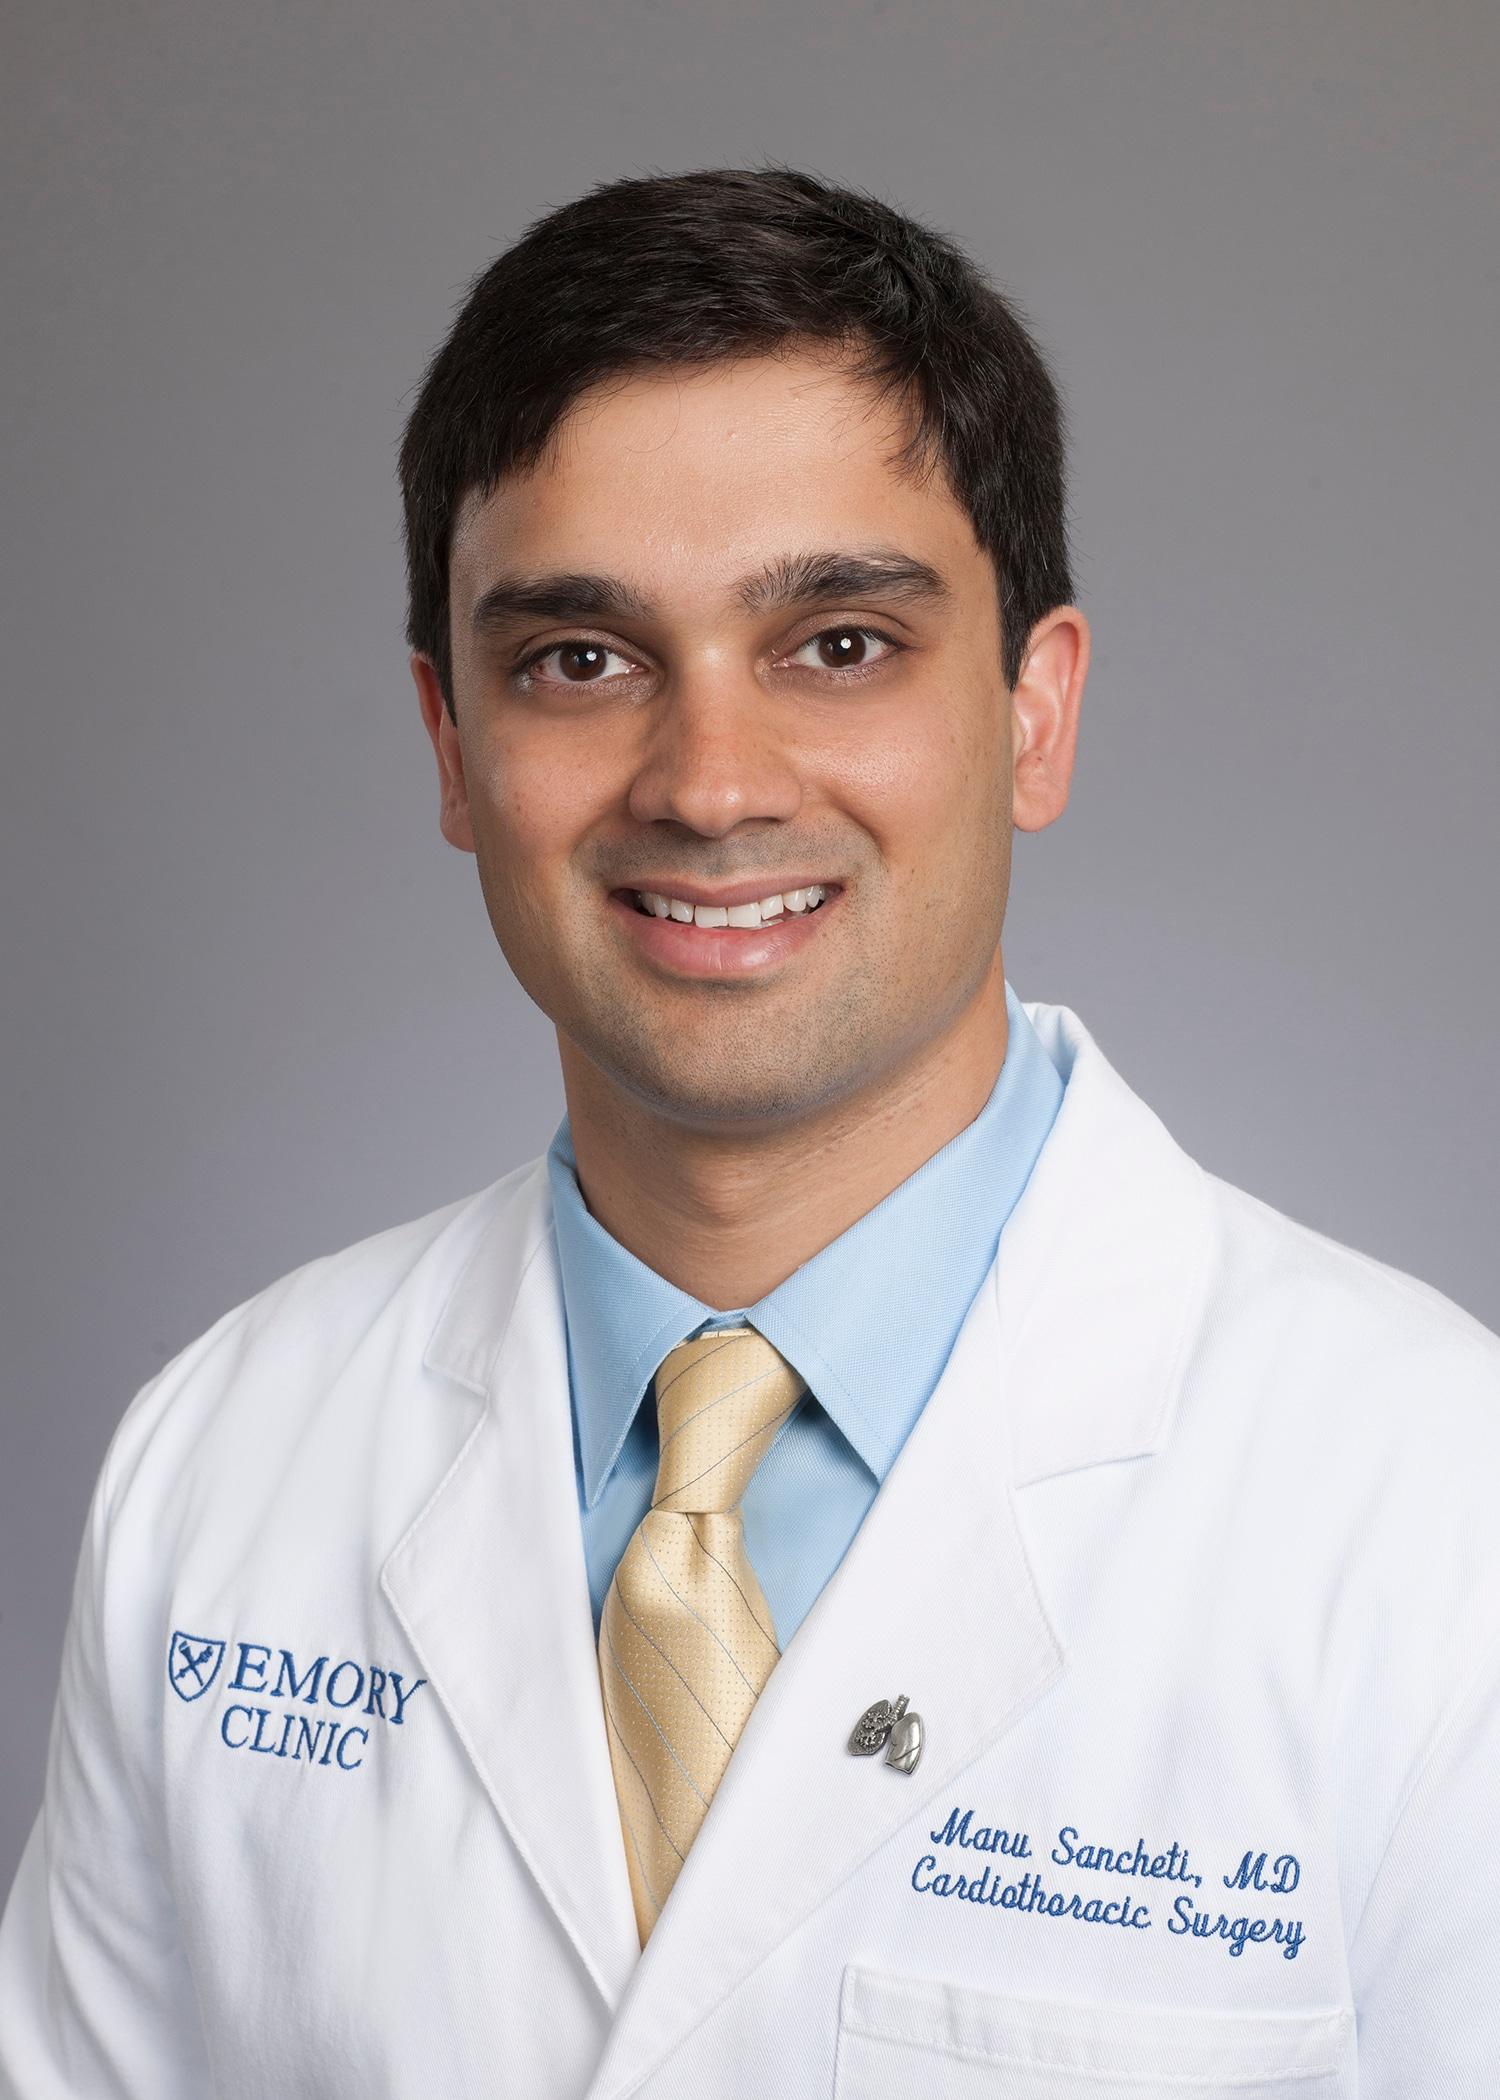 Manu S Sancheti, MD General Surgery